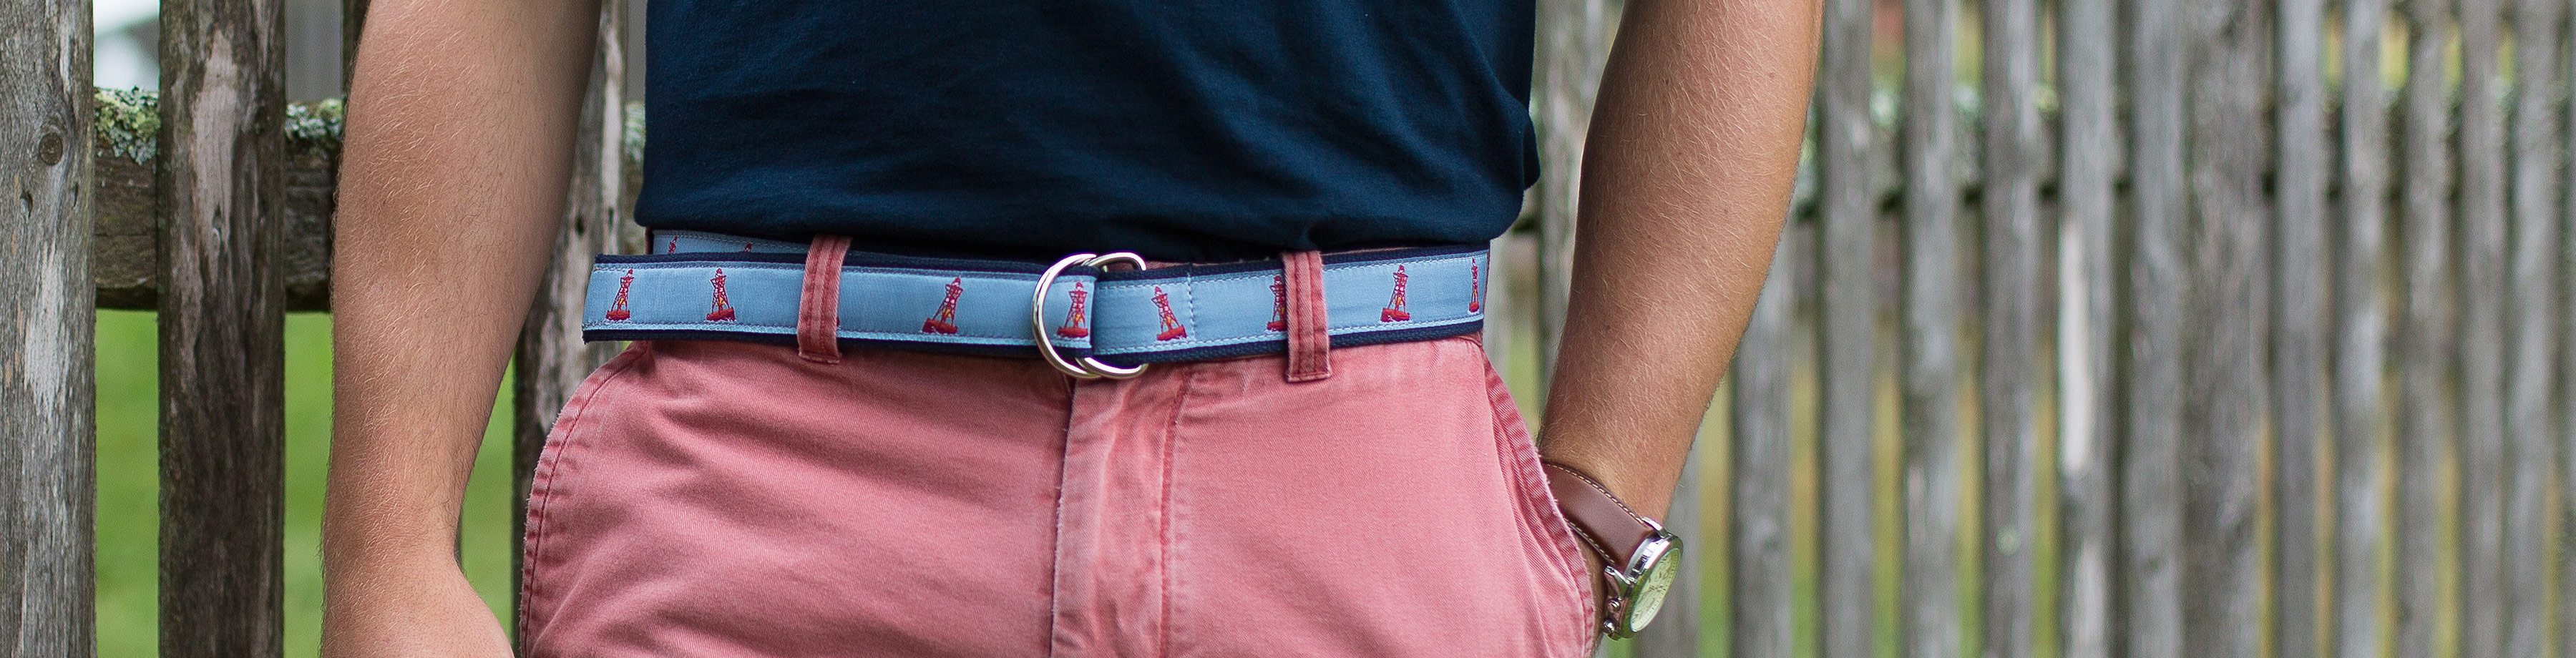 Belt showcased on red shorts